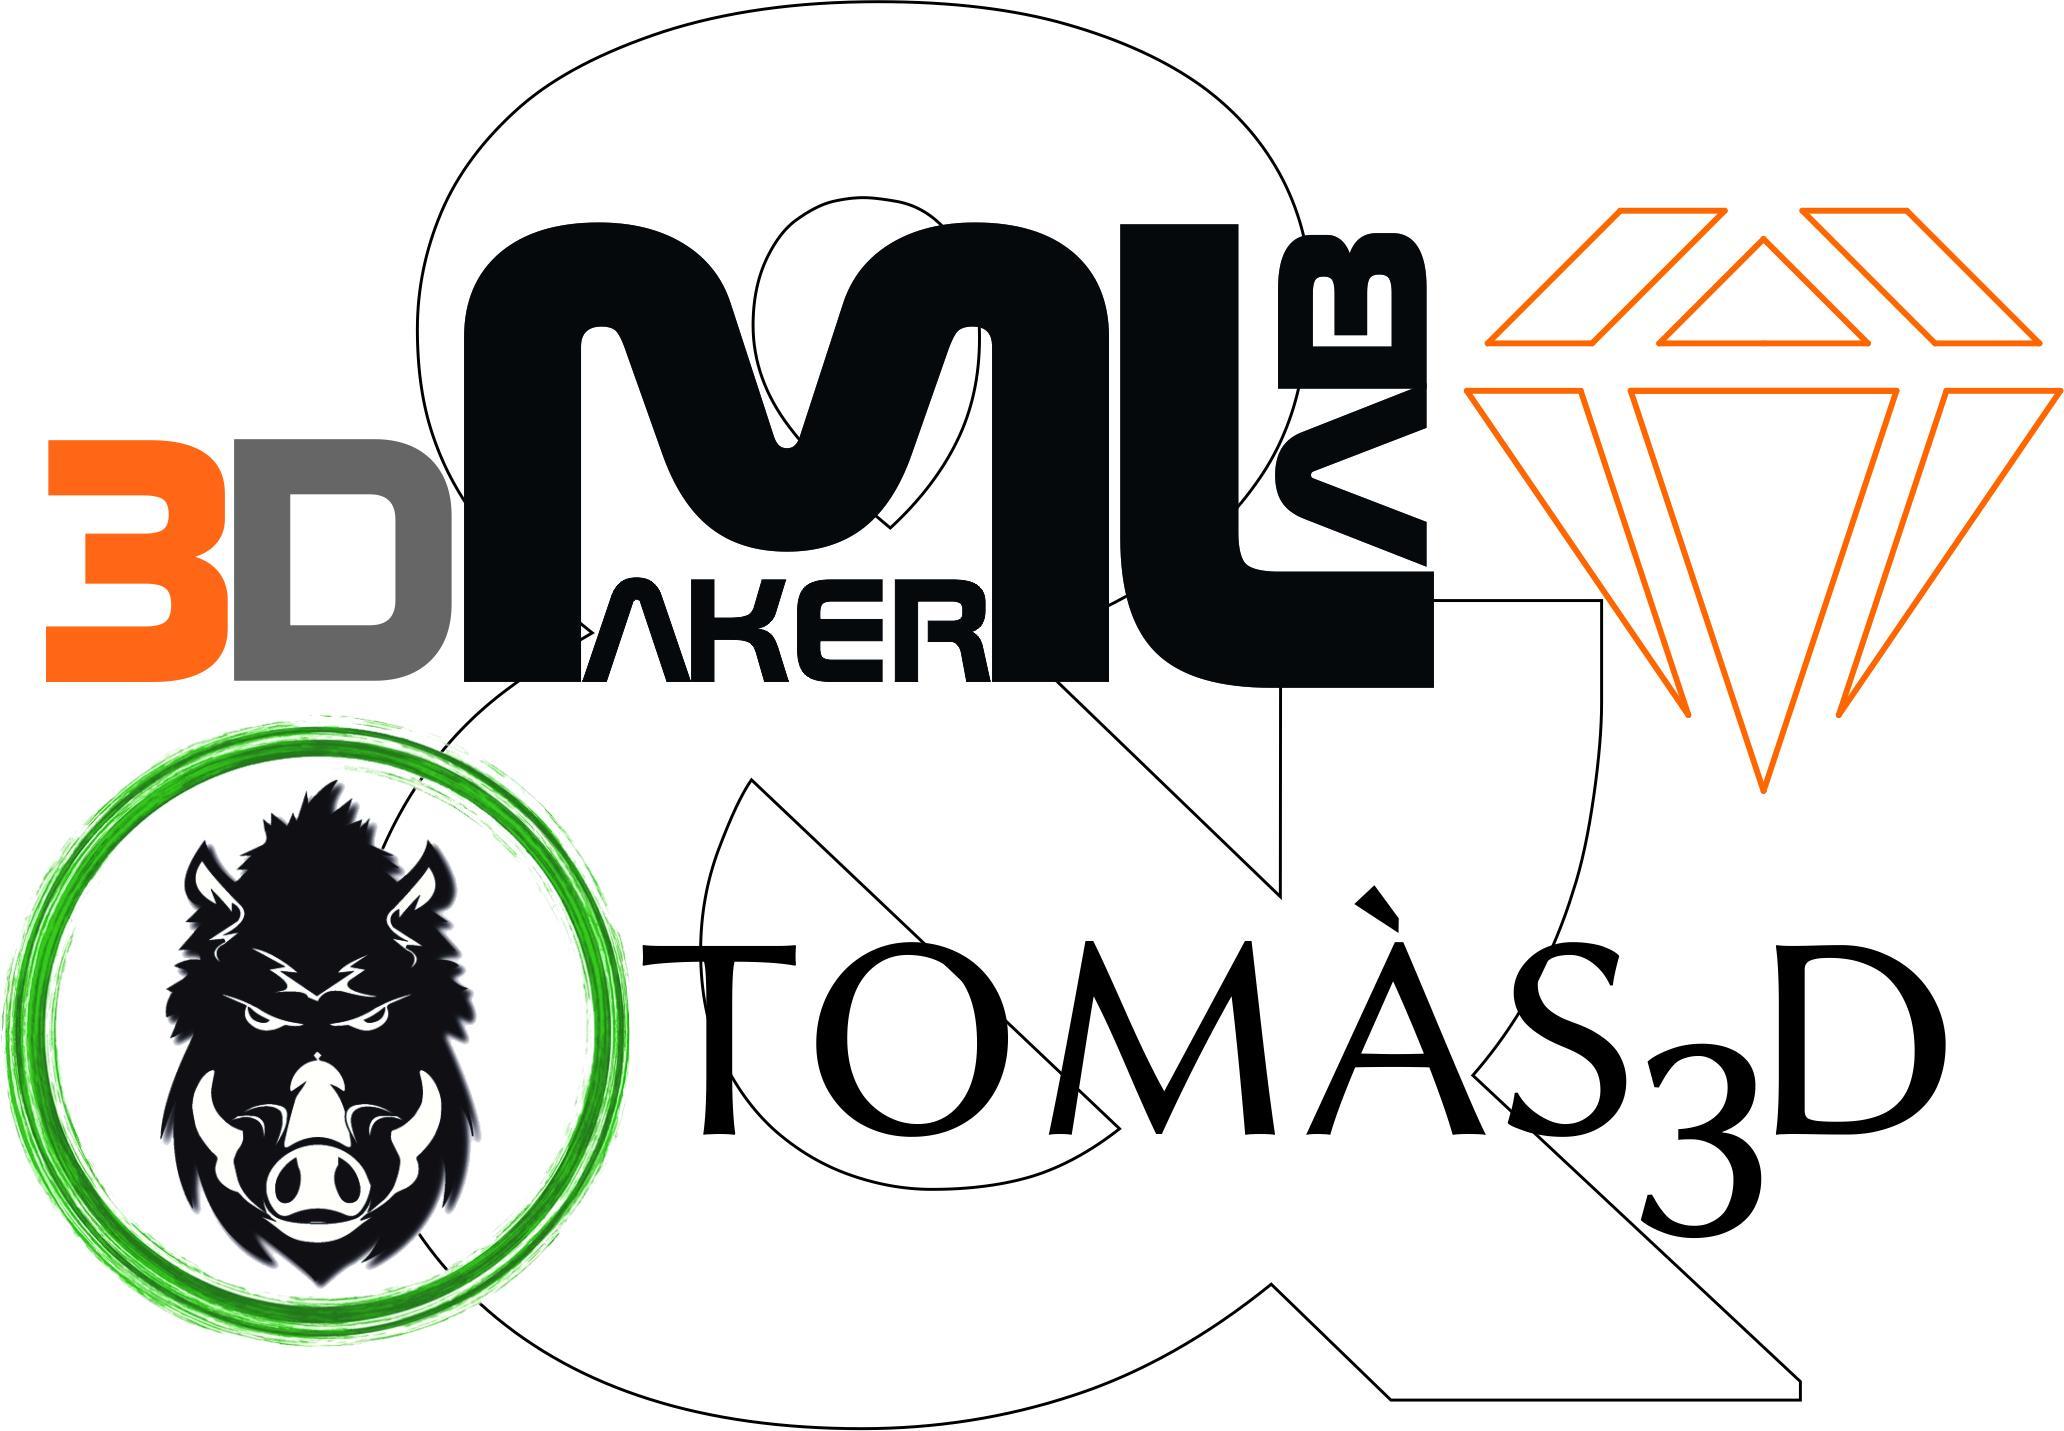 3DMakerLab - Tomàs3D